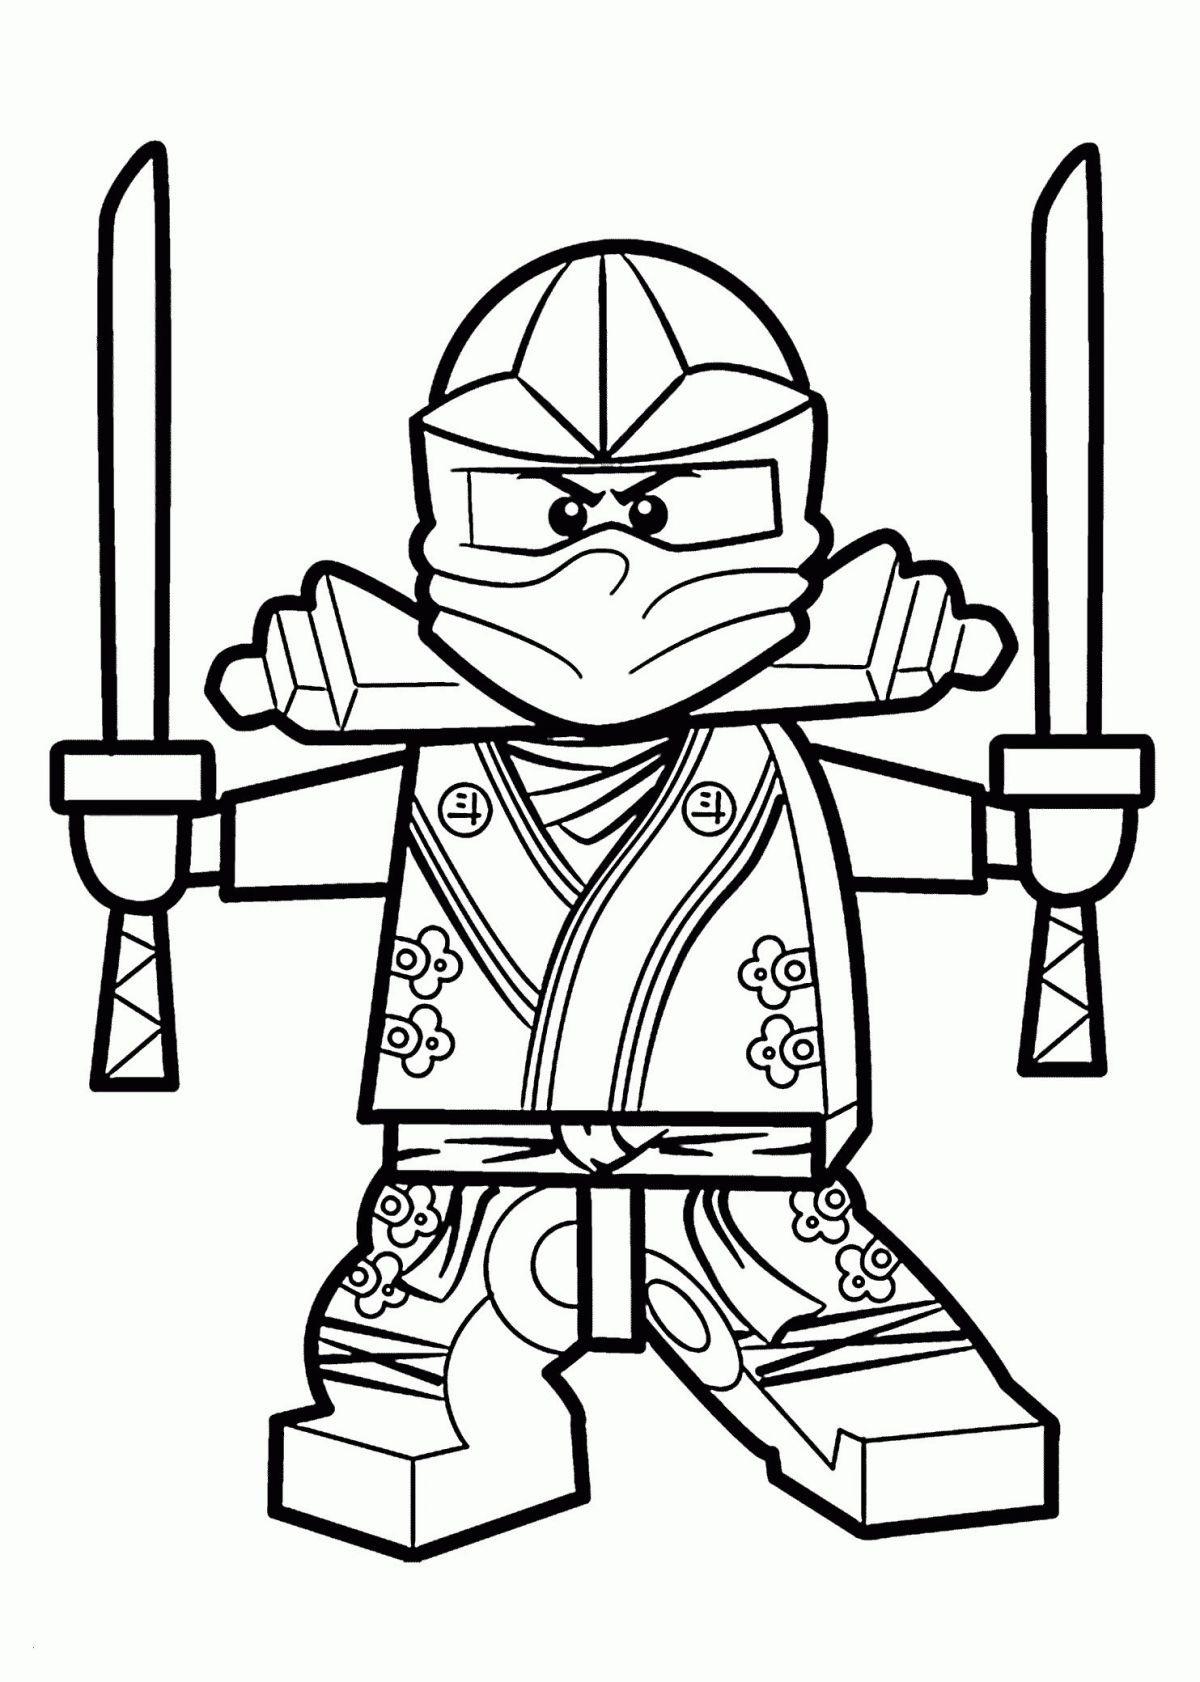 Ninjago Jay Ausmalbilder Inspirierend 40 Ninjago Ausmalbilder Goldener Ninja Scoredatscore Elegant Ninjago Sammlung